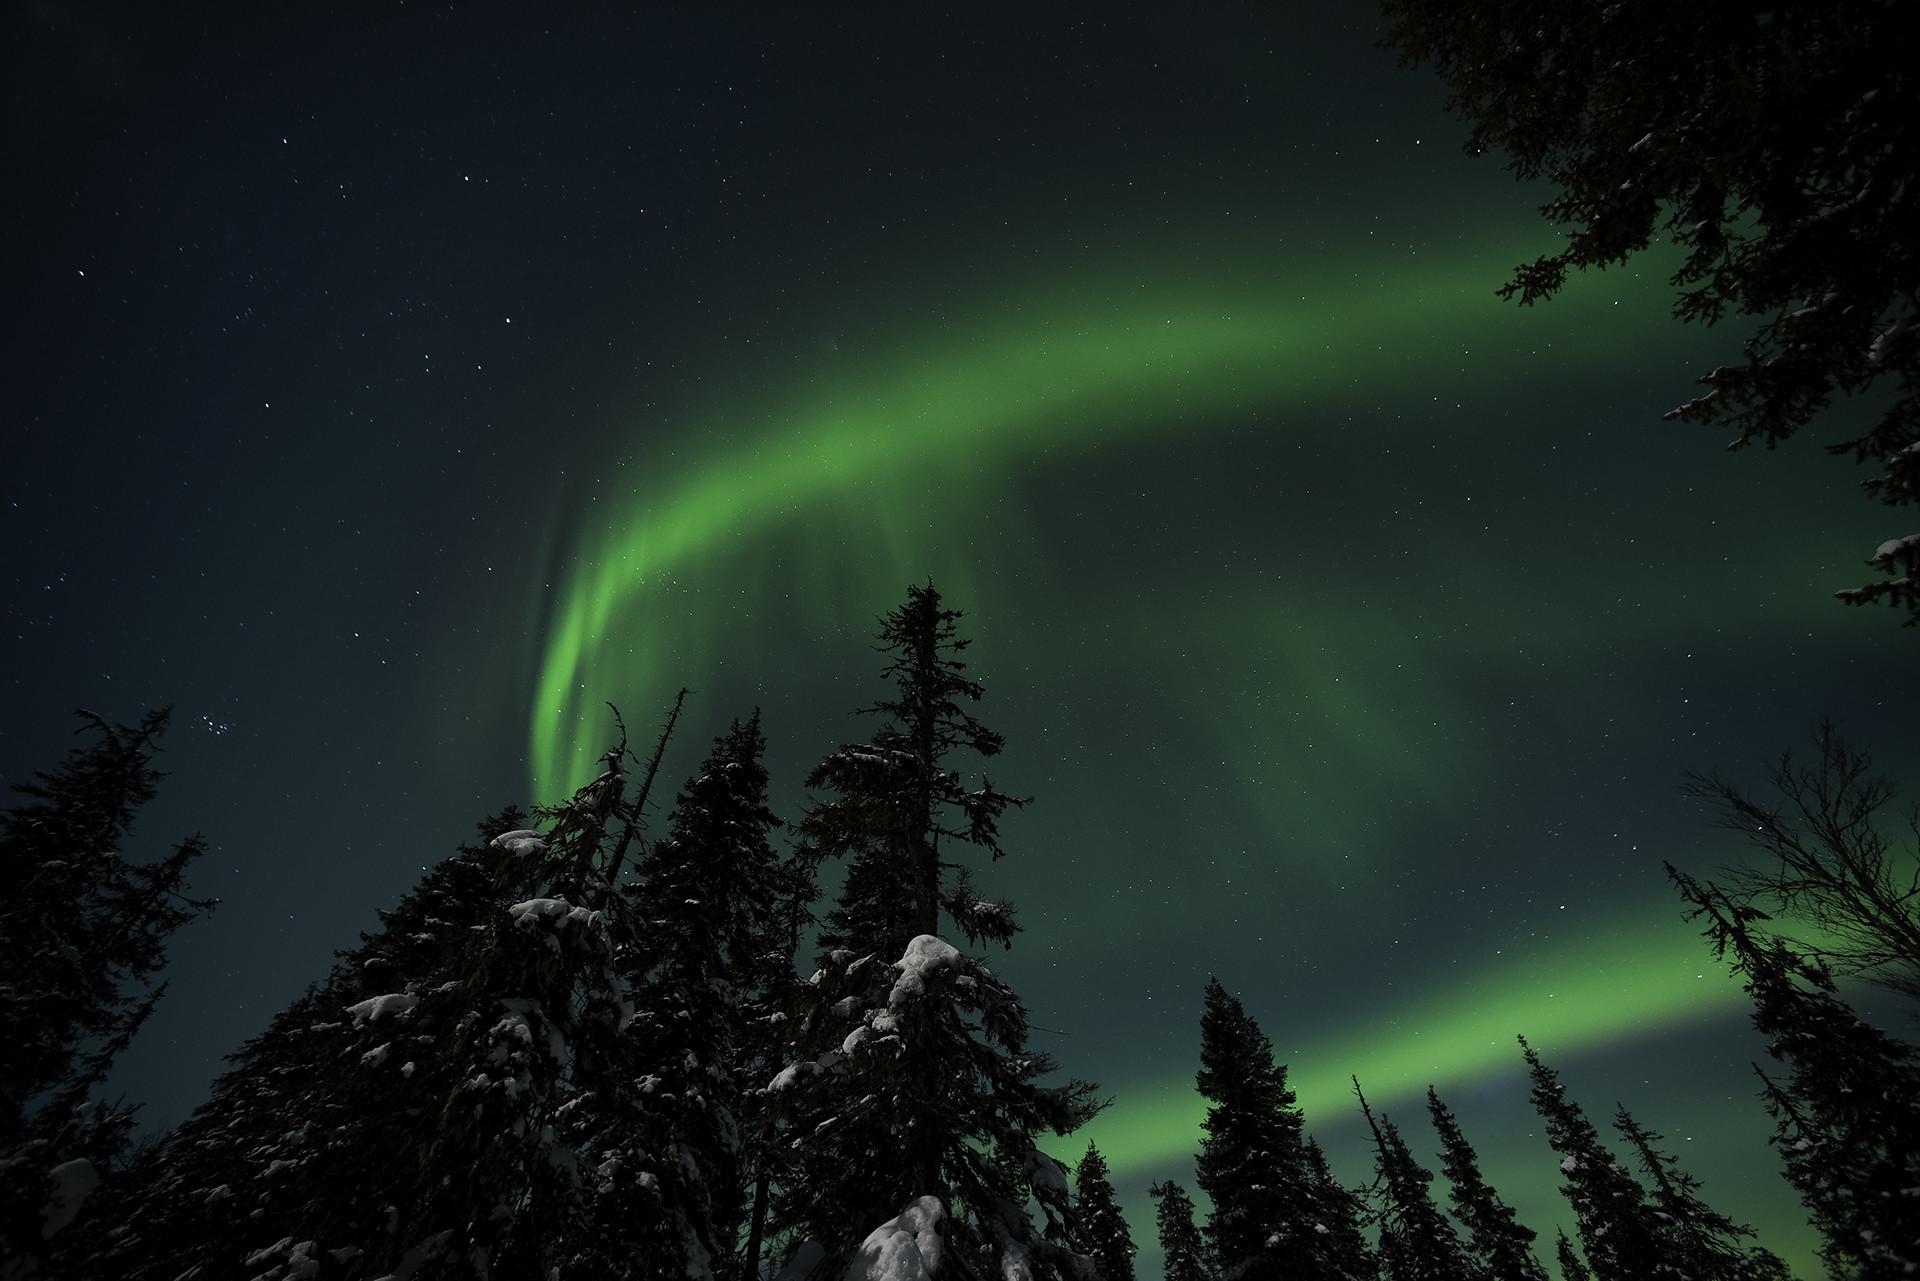 hossa-finland-veronikasadventure